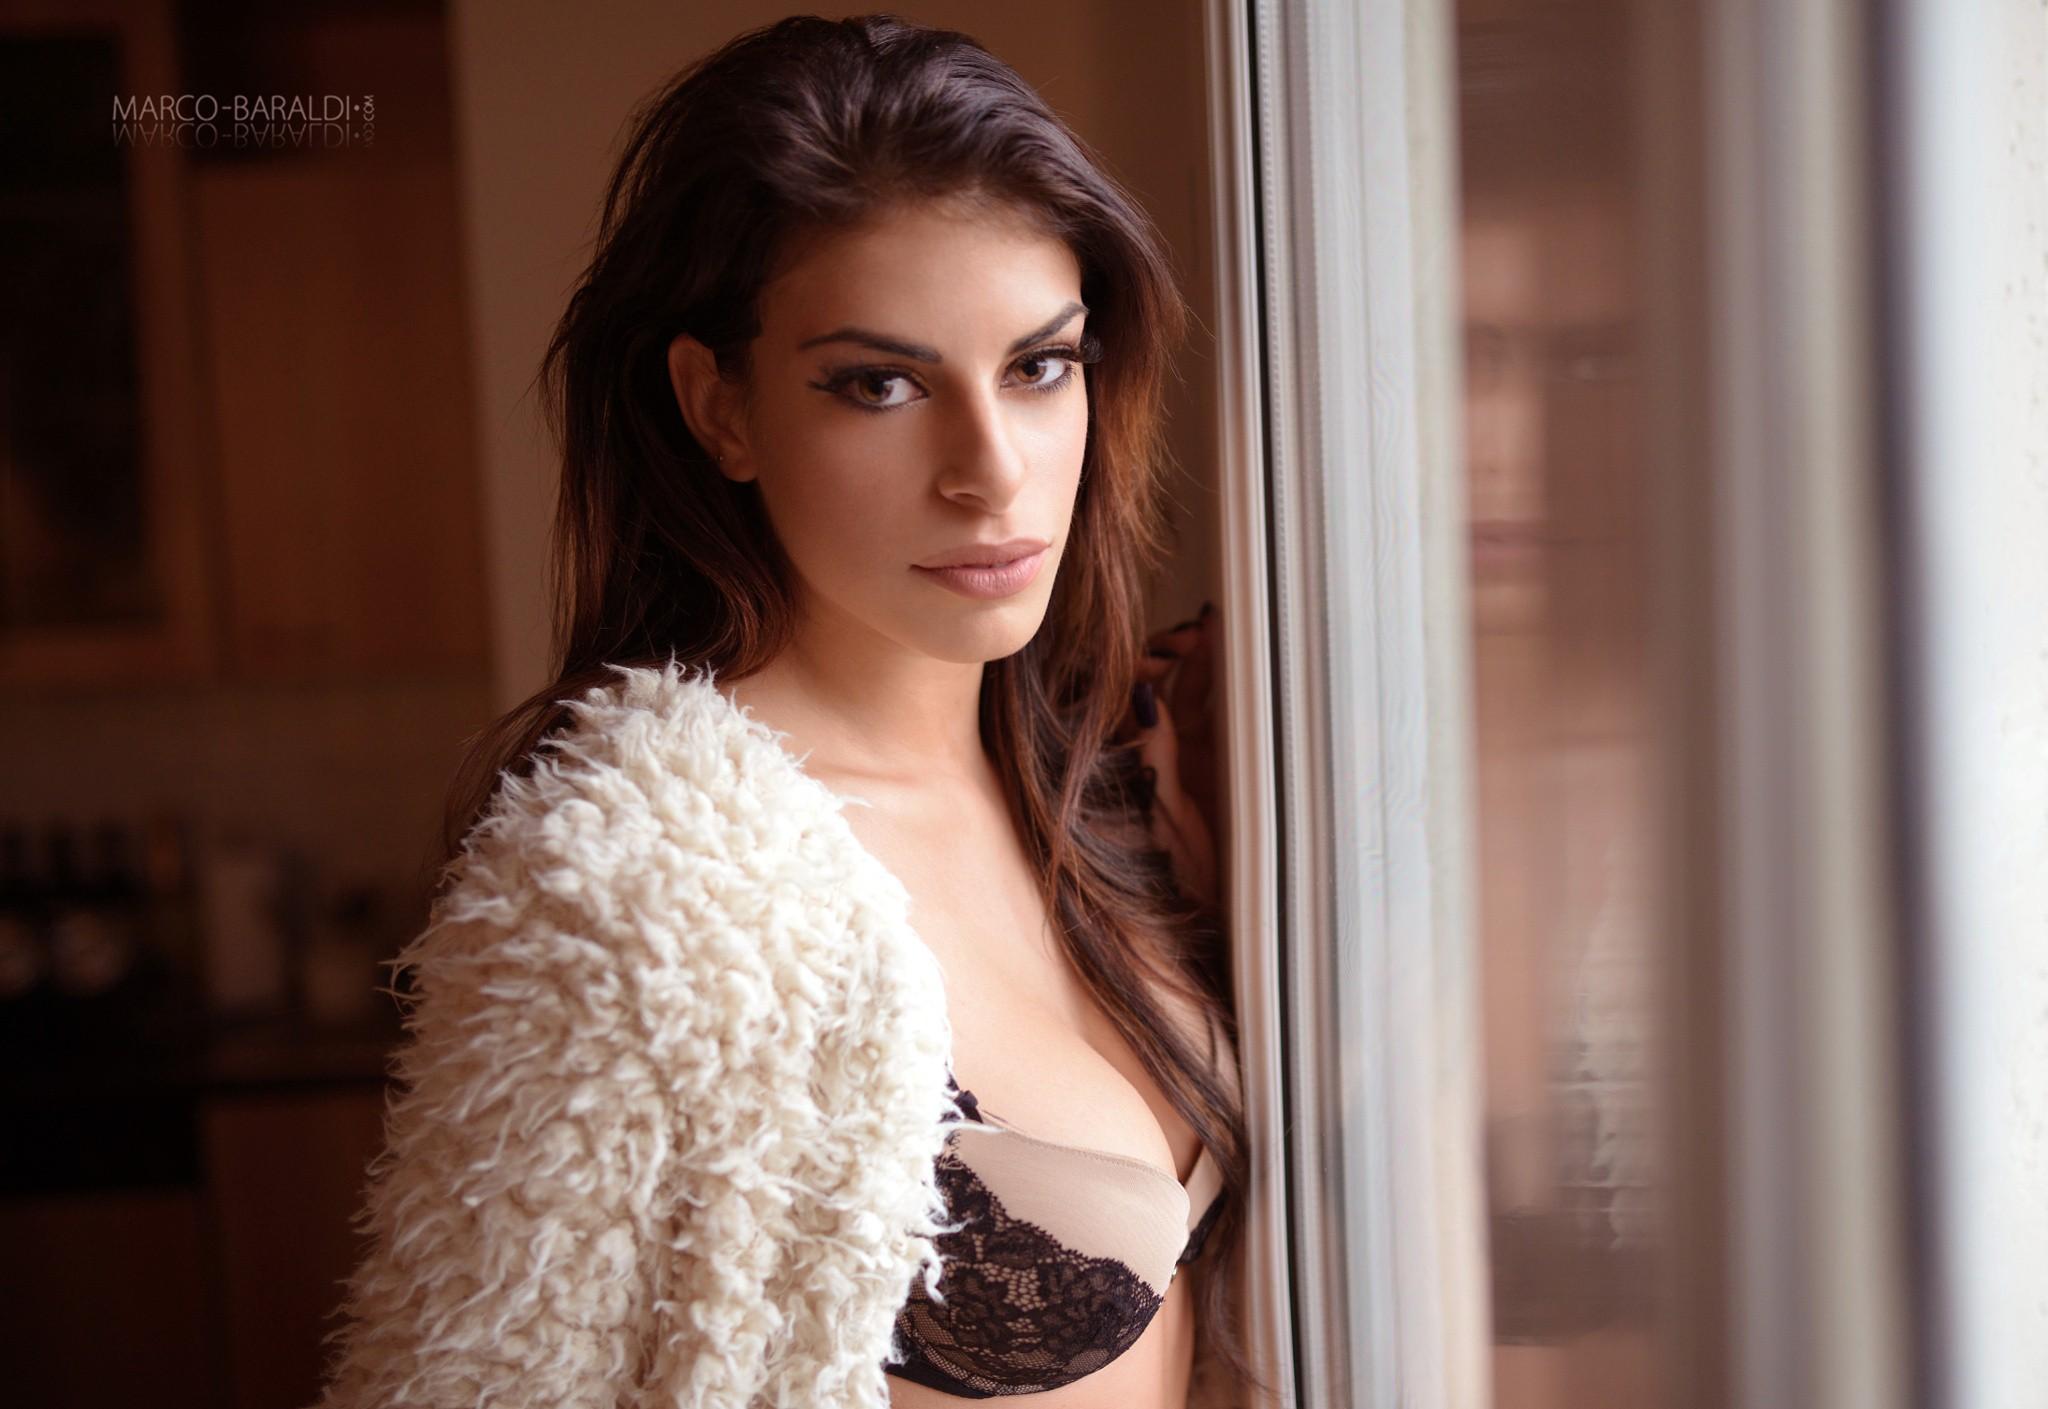 Fondos de pantalla : cara, modelo, pelo largo, fotografía, vestir ...